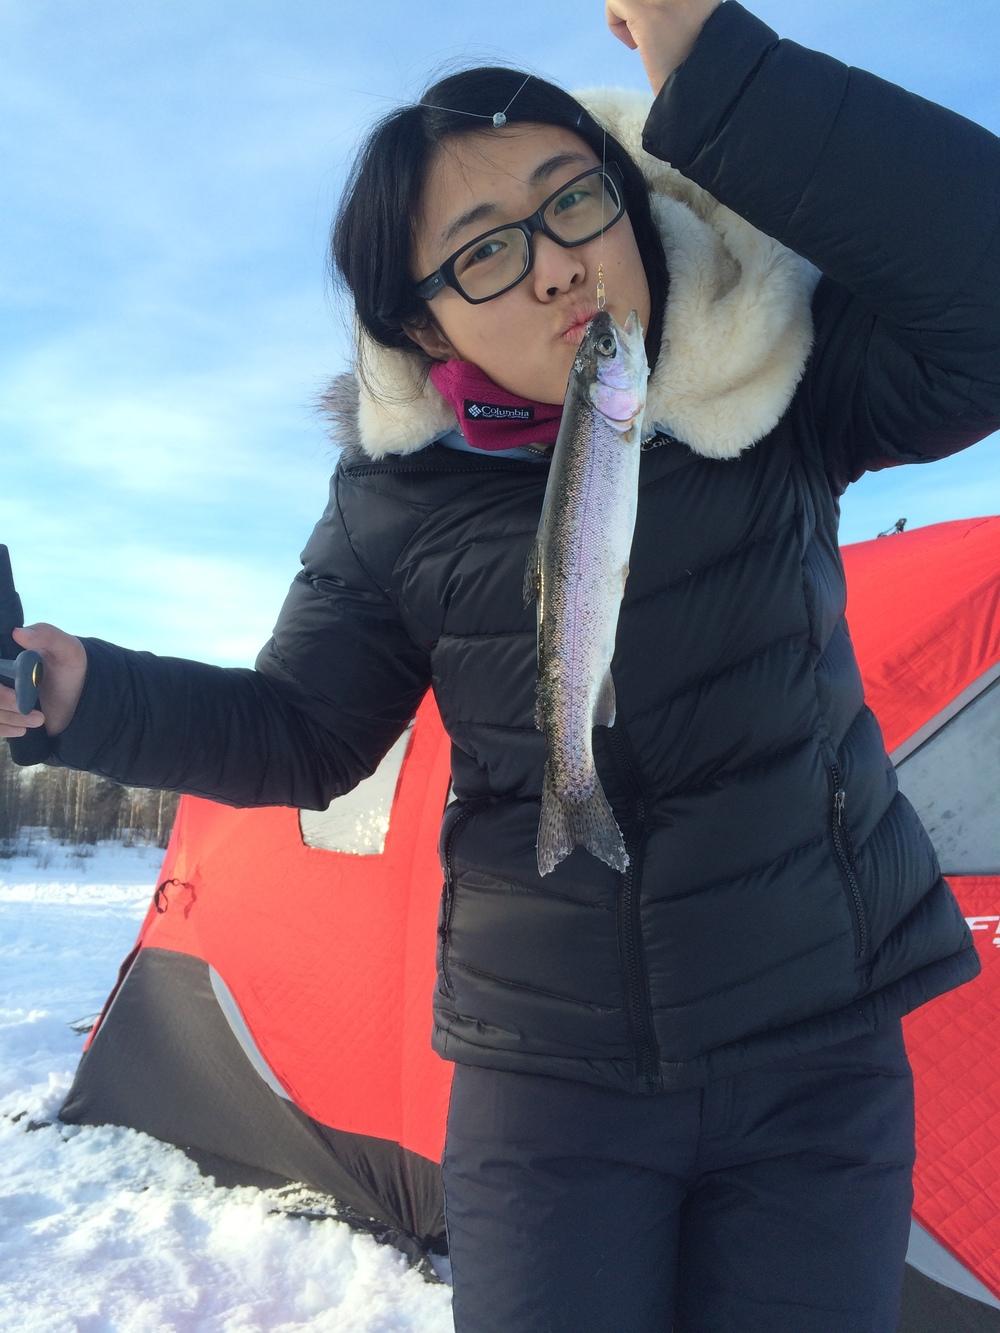 Alaska ice fishing, Fairbanks fishing, Fairbanks ice fishing, Fairbanks fishing tours, Alaska Ice fishing tour, Alaska Fishing